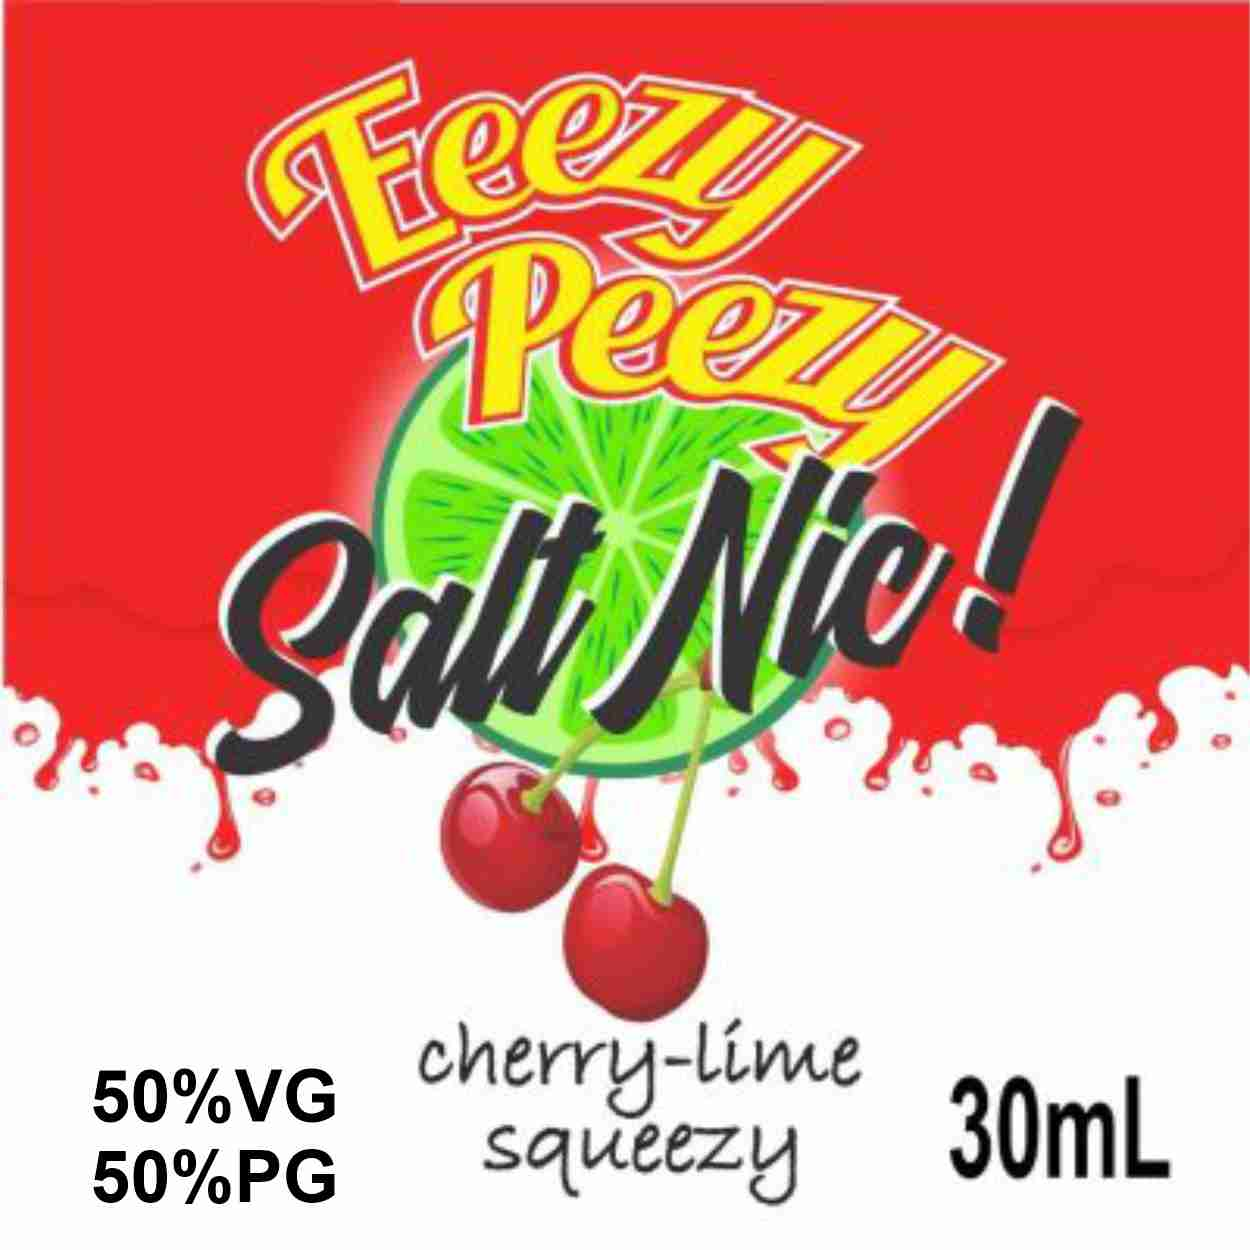 Cherry Lime Squeezy Salt Nic